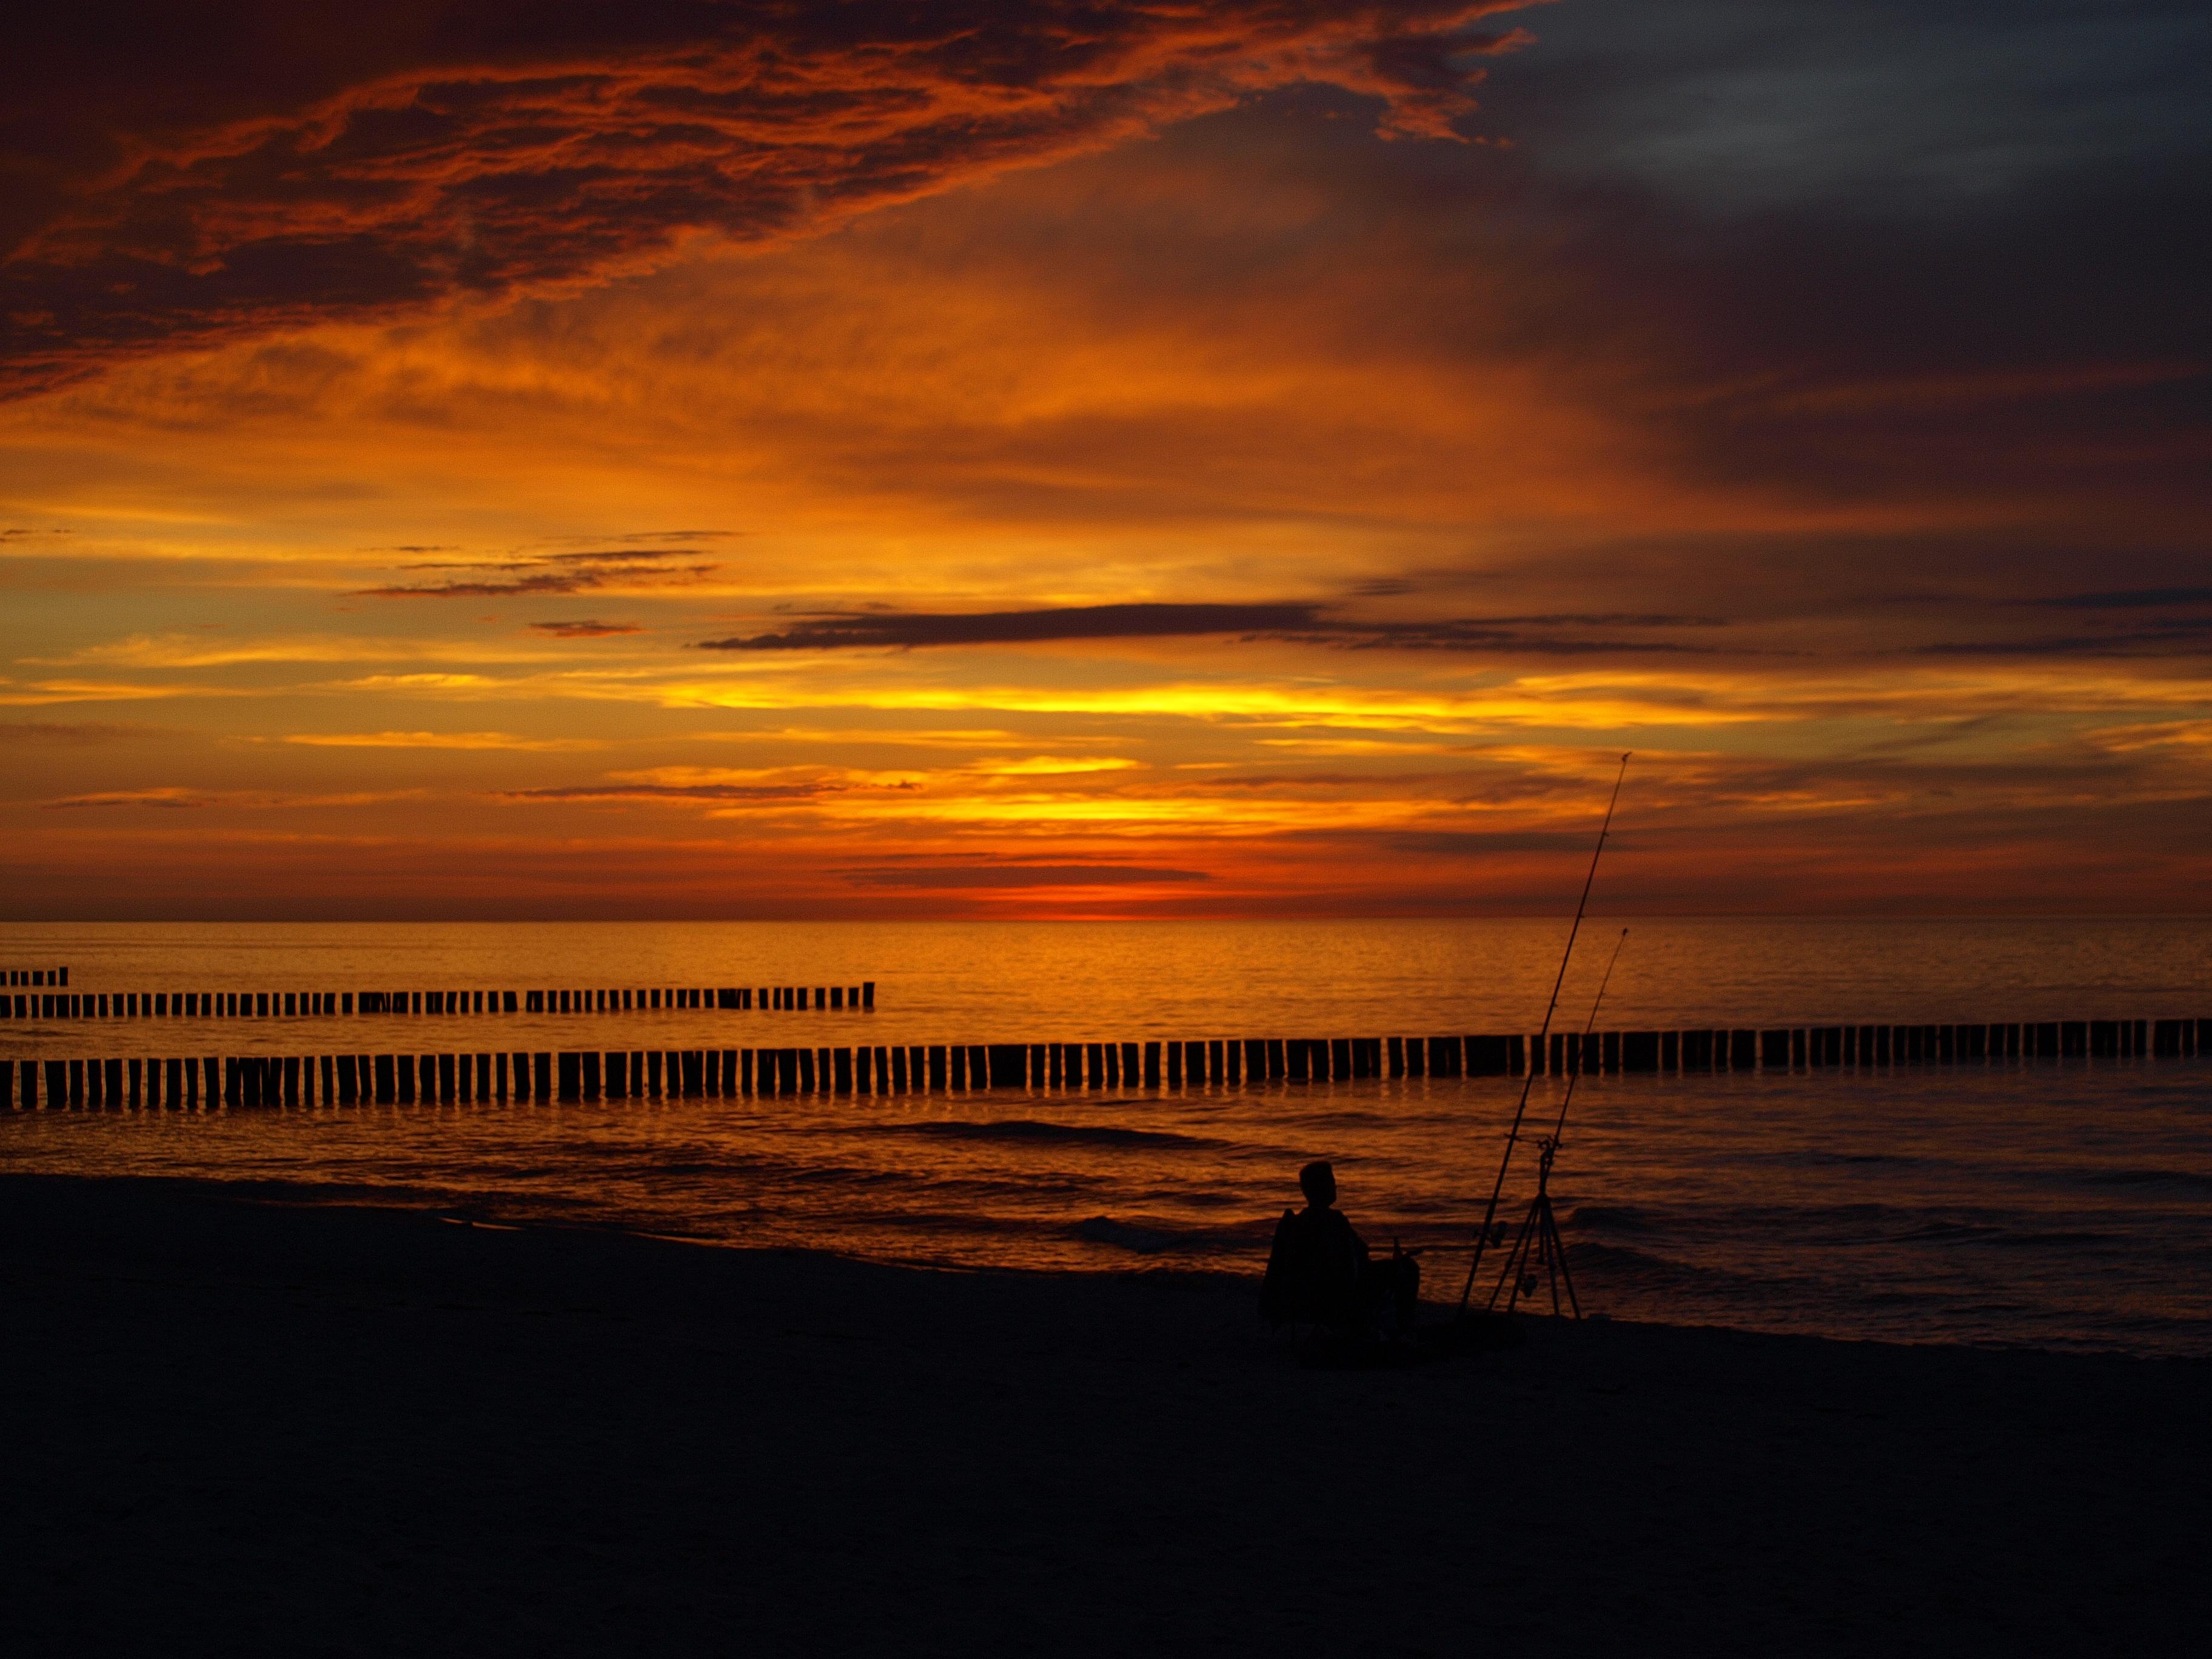 Sonnenuntergang mit Angler